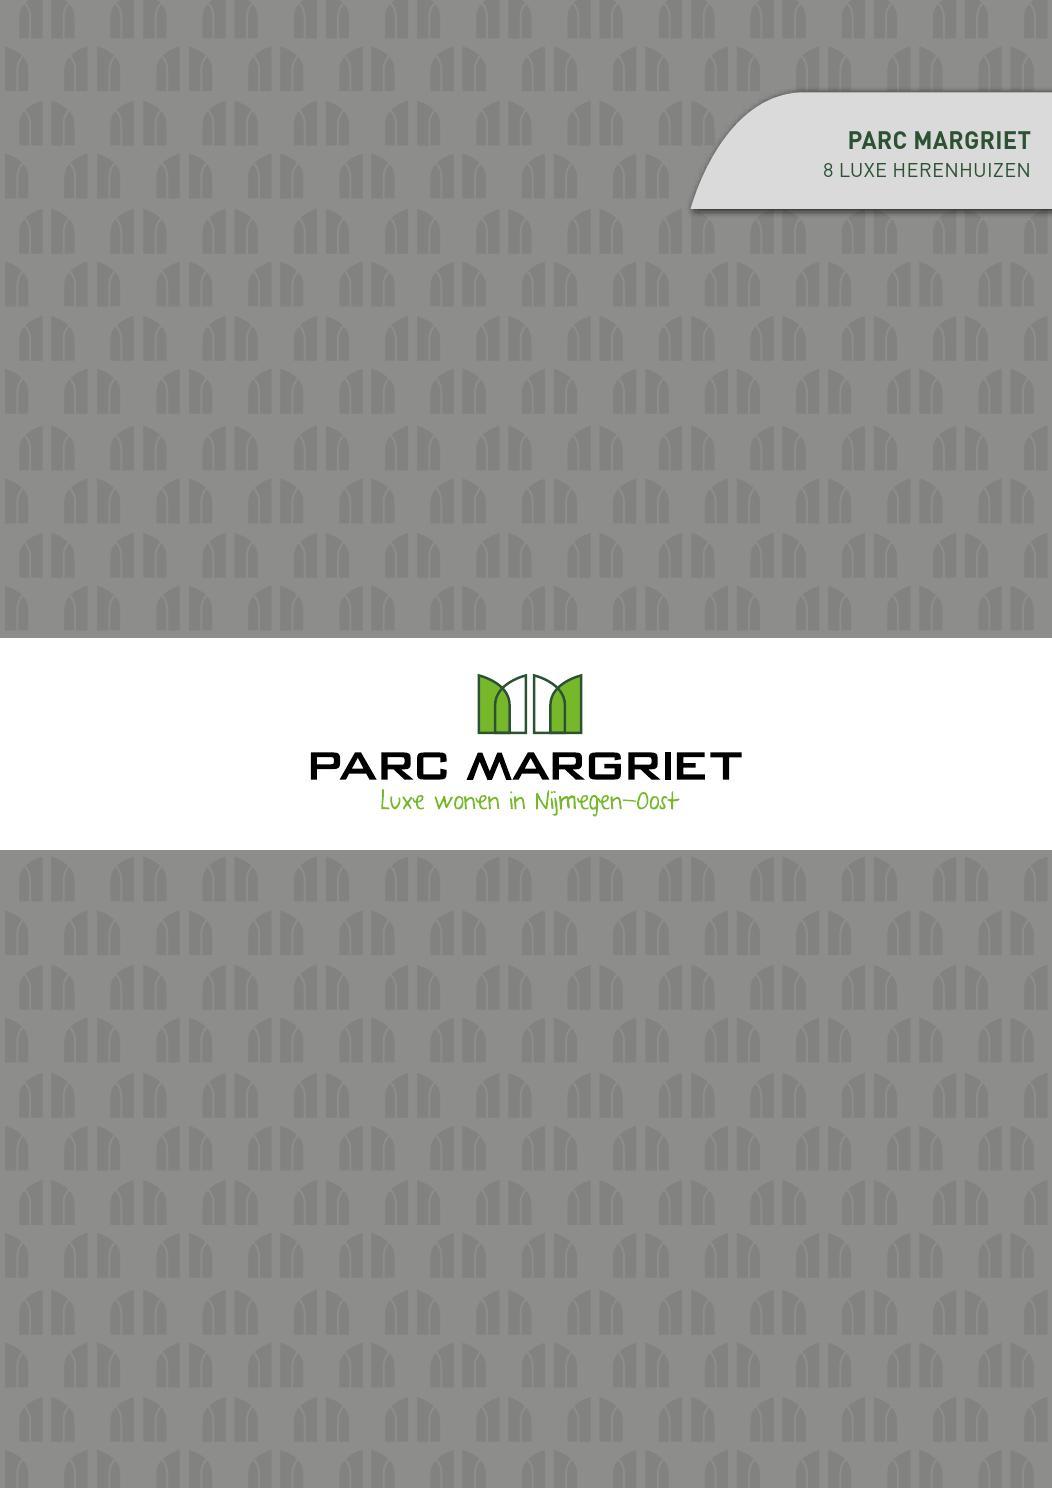 Brochure Parc Margriet - 8 luxe herenhuizen by Beter Wonen In - issuu